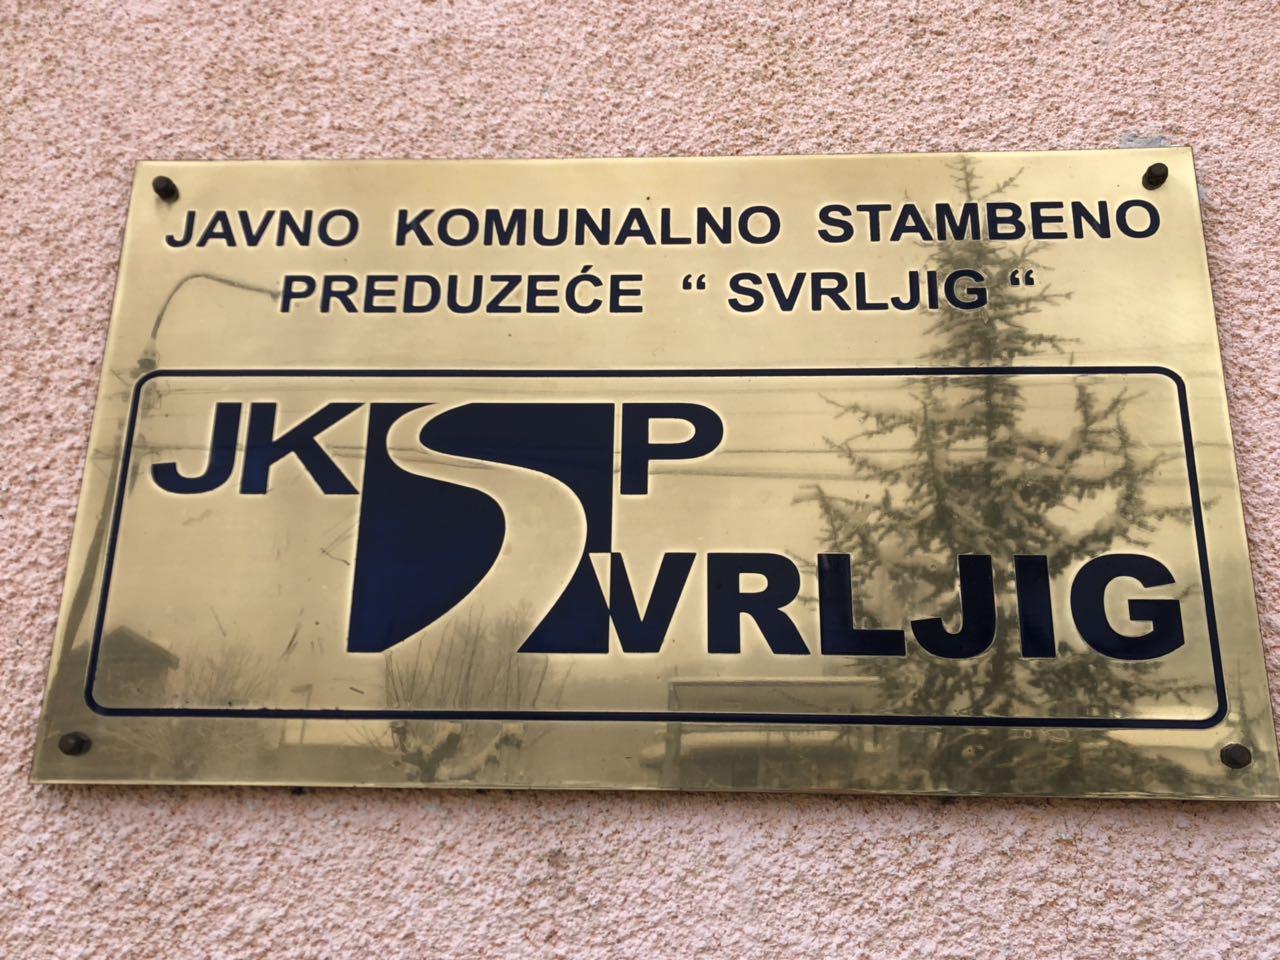 JKSP ''Svrljig'' Svrljig, foto: M.E.